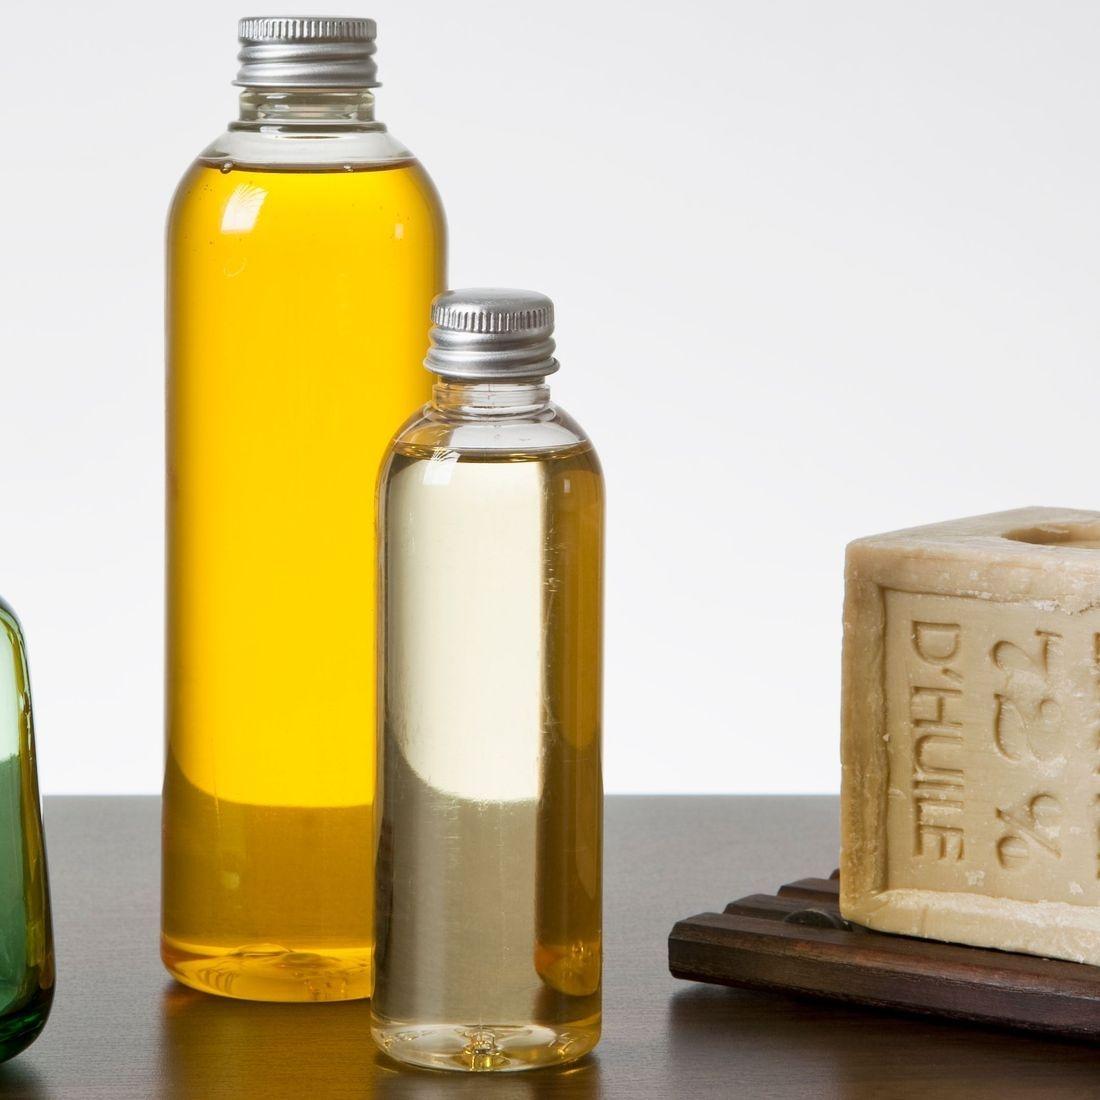 Greensburg Massage offers castor oil treatment of the abdomen